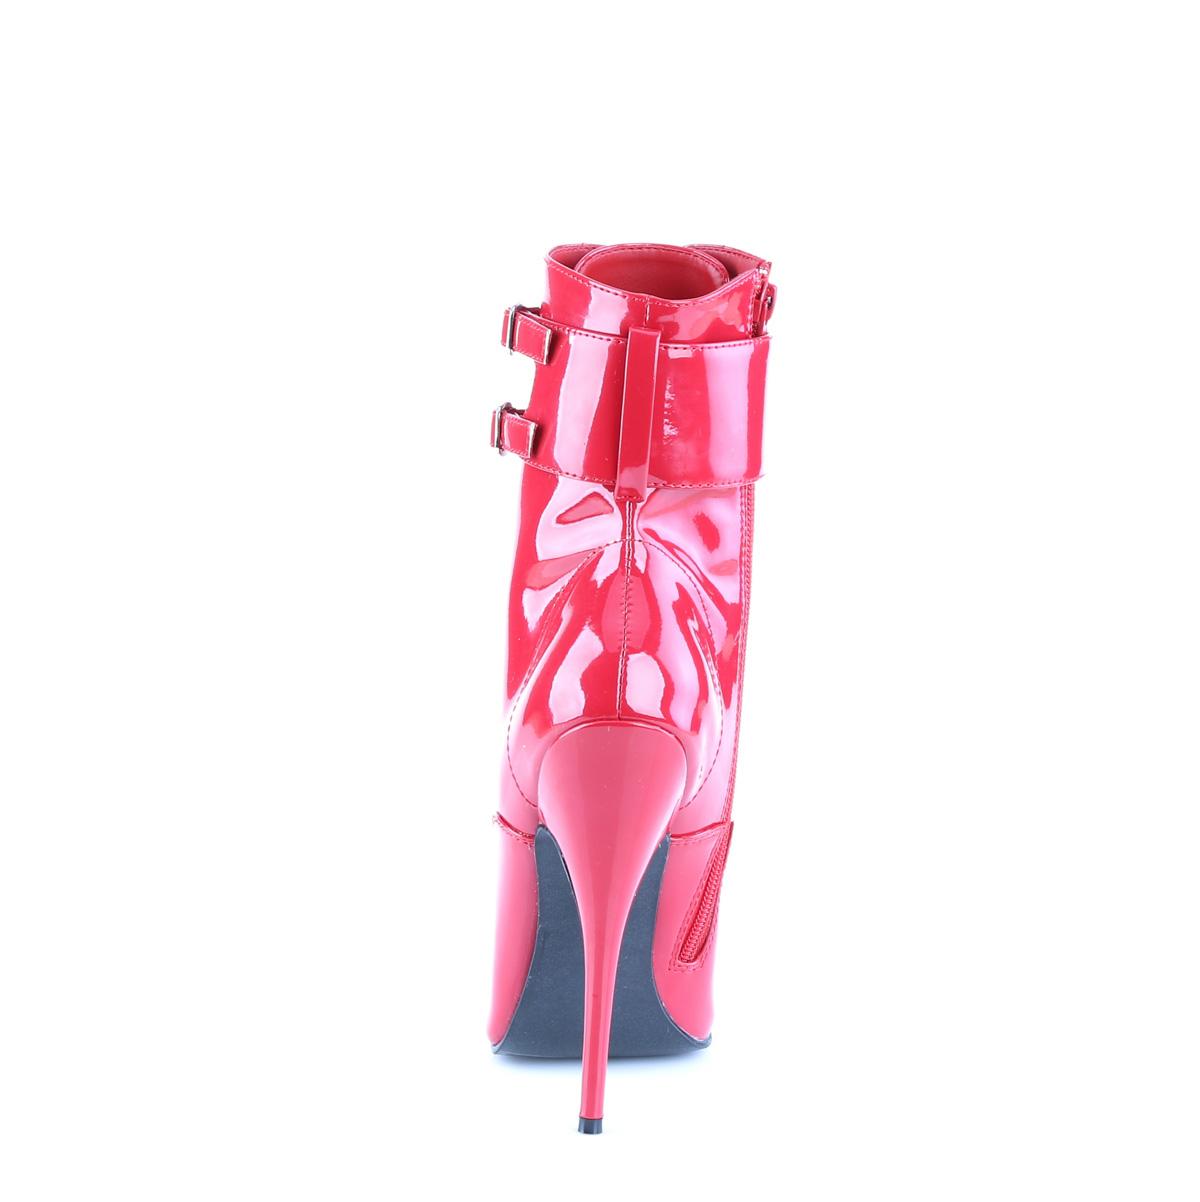 DEVIOUS(Pleaser) DOMINA-1023 ショートブーツ 交換可能な3種類のアンクルカフ付き プリーザー エナメル赤 レッド 約15cmハイヒール◆取り寄せ